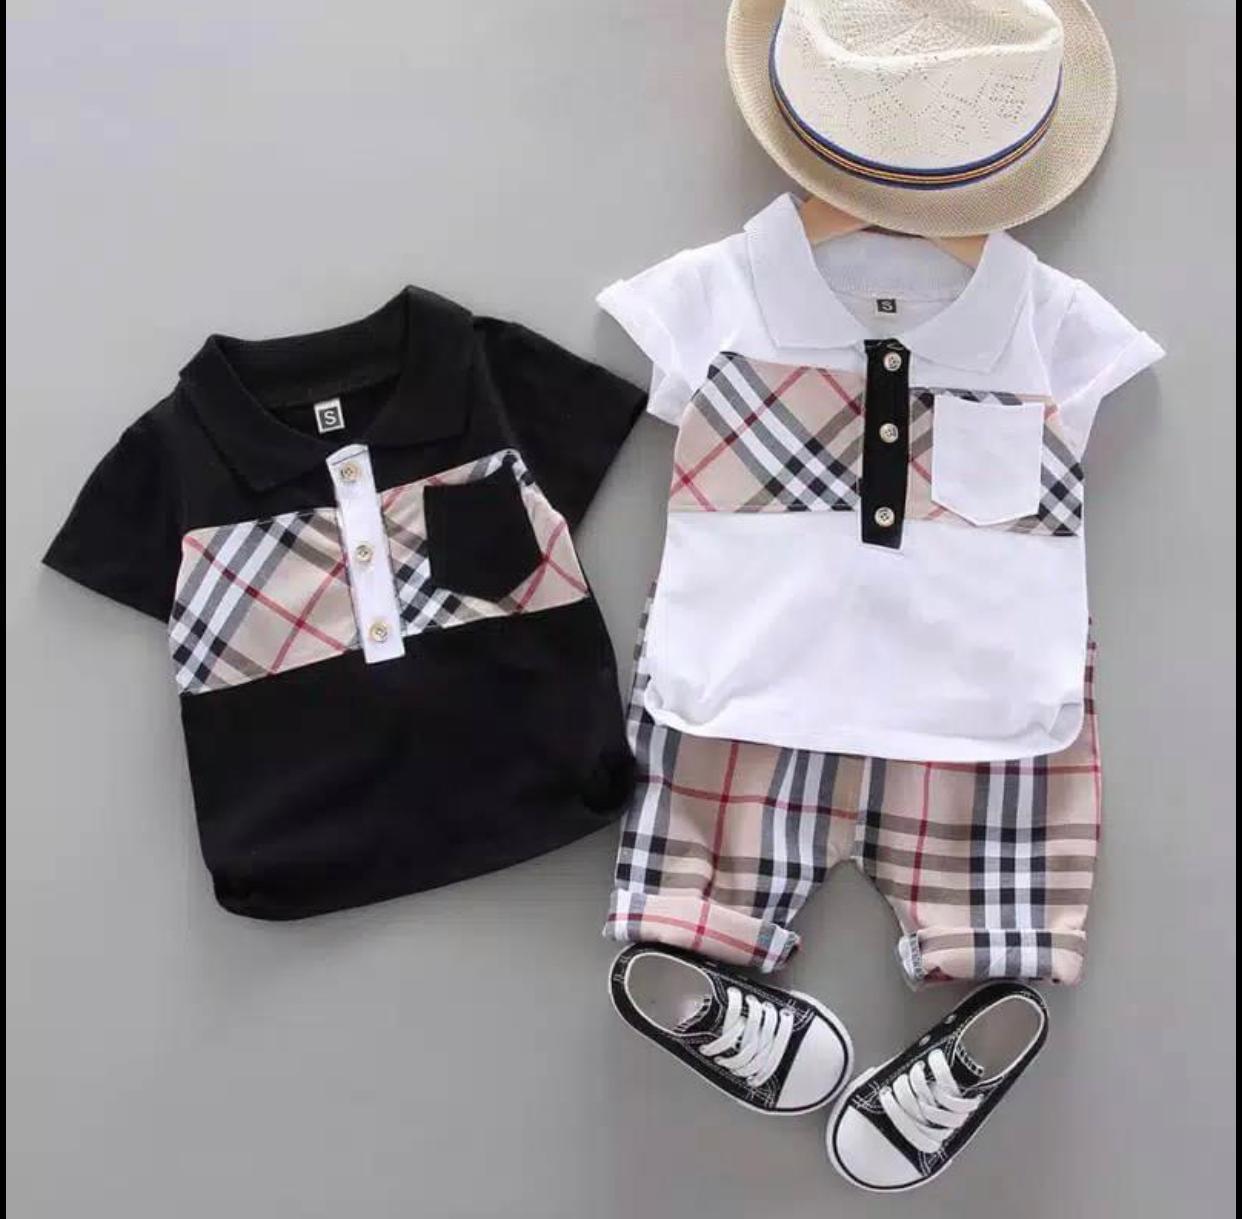 cod / free ongkir / stelan anak 1-5th / baju anak / stelan baju anak terlaris / grosir baju anak